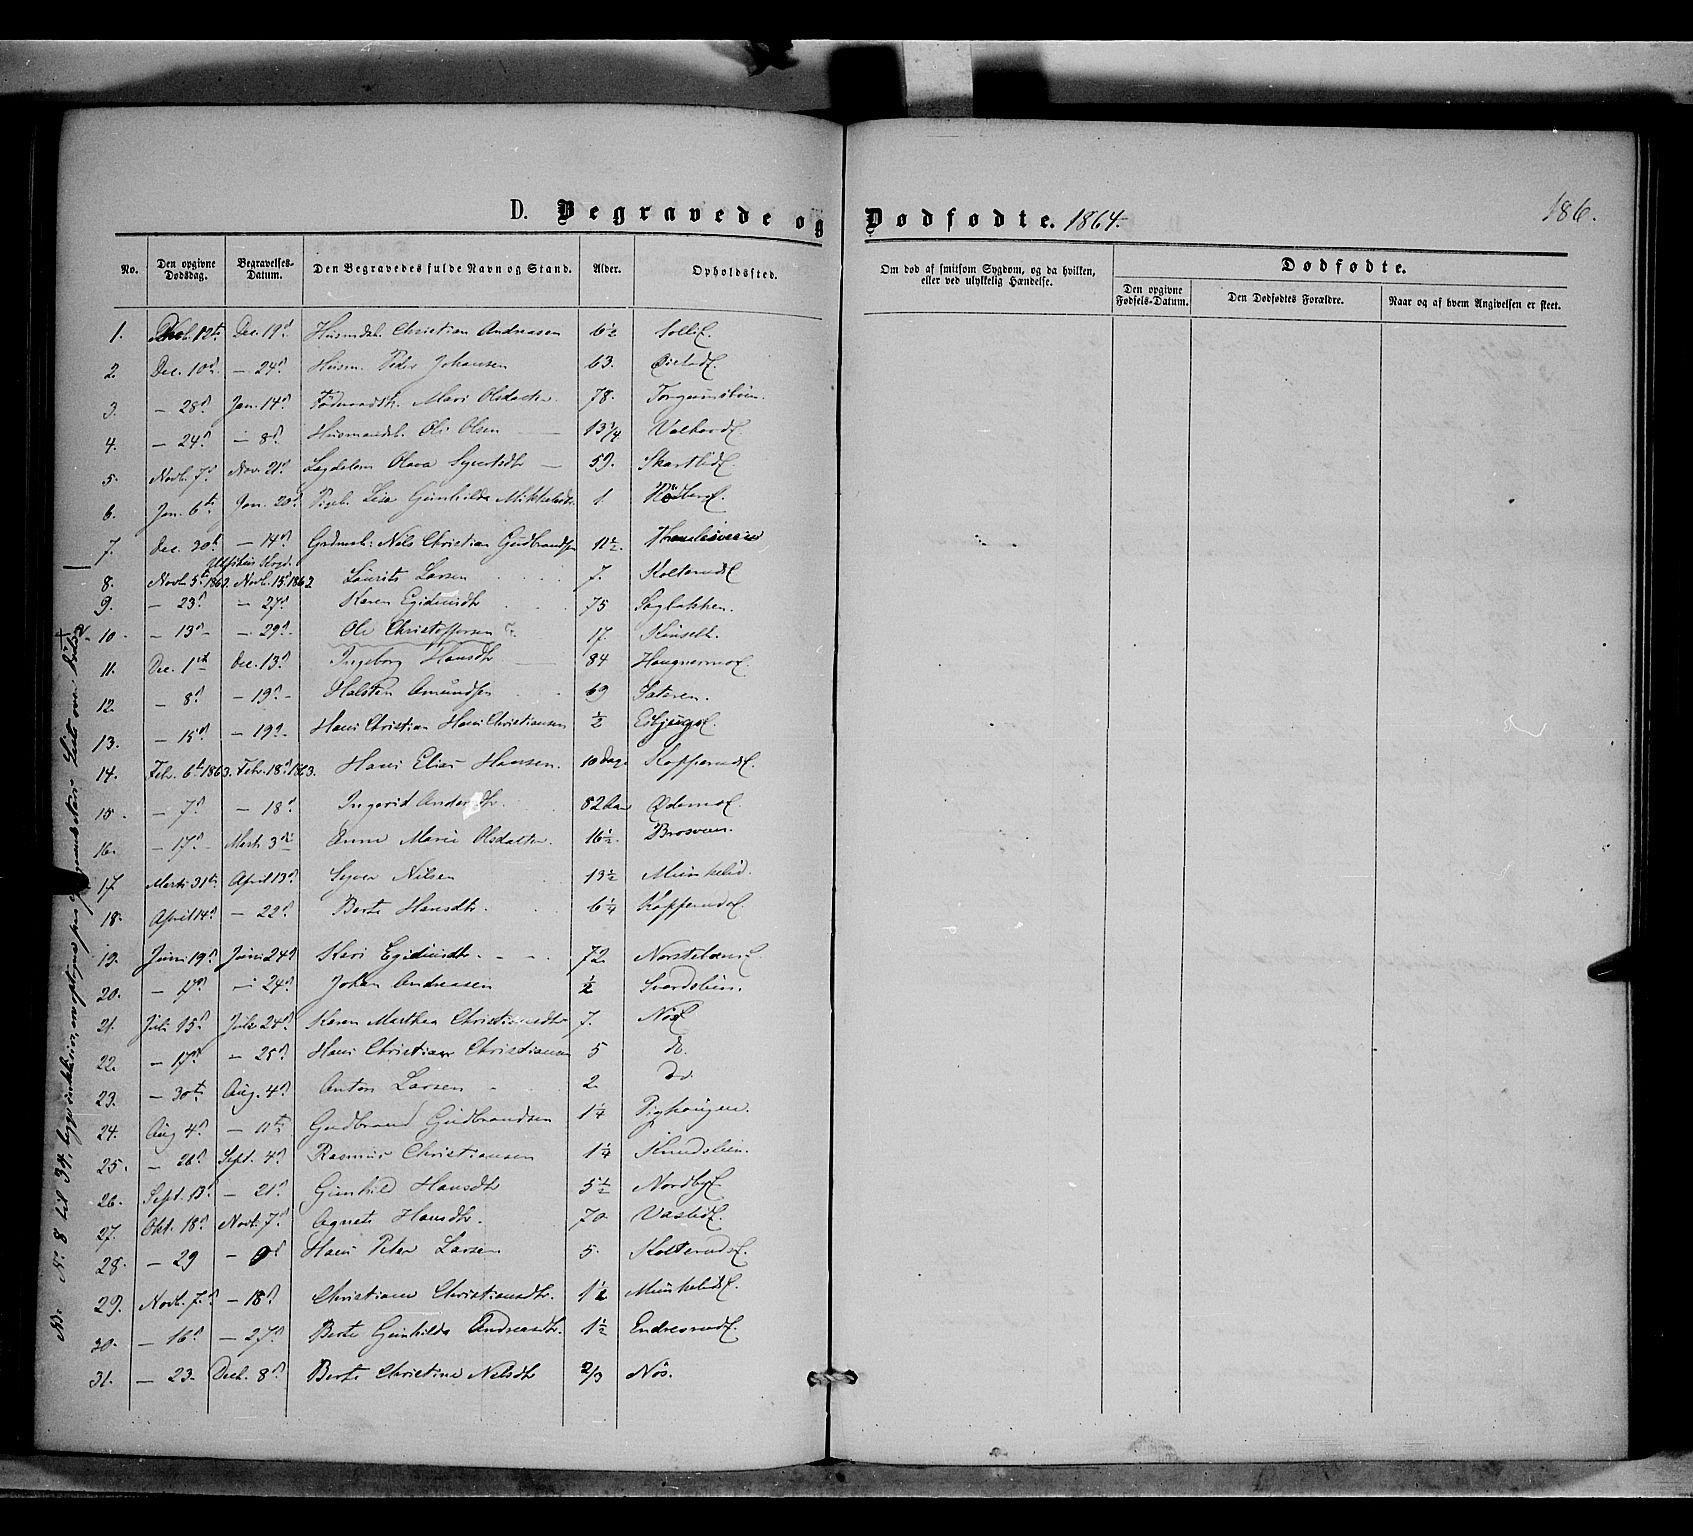 SAH, Nordre Land prestekontor, Ministerialbok nr. 1, 1860-1871, s. 186